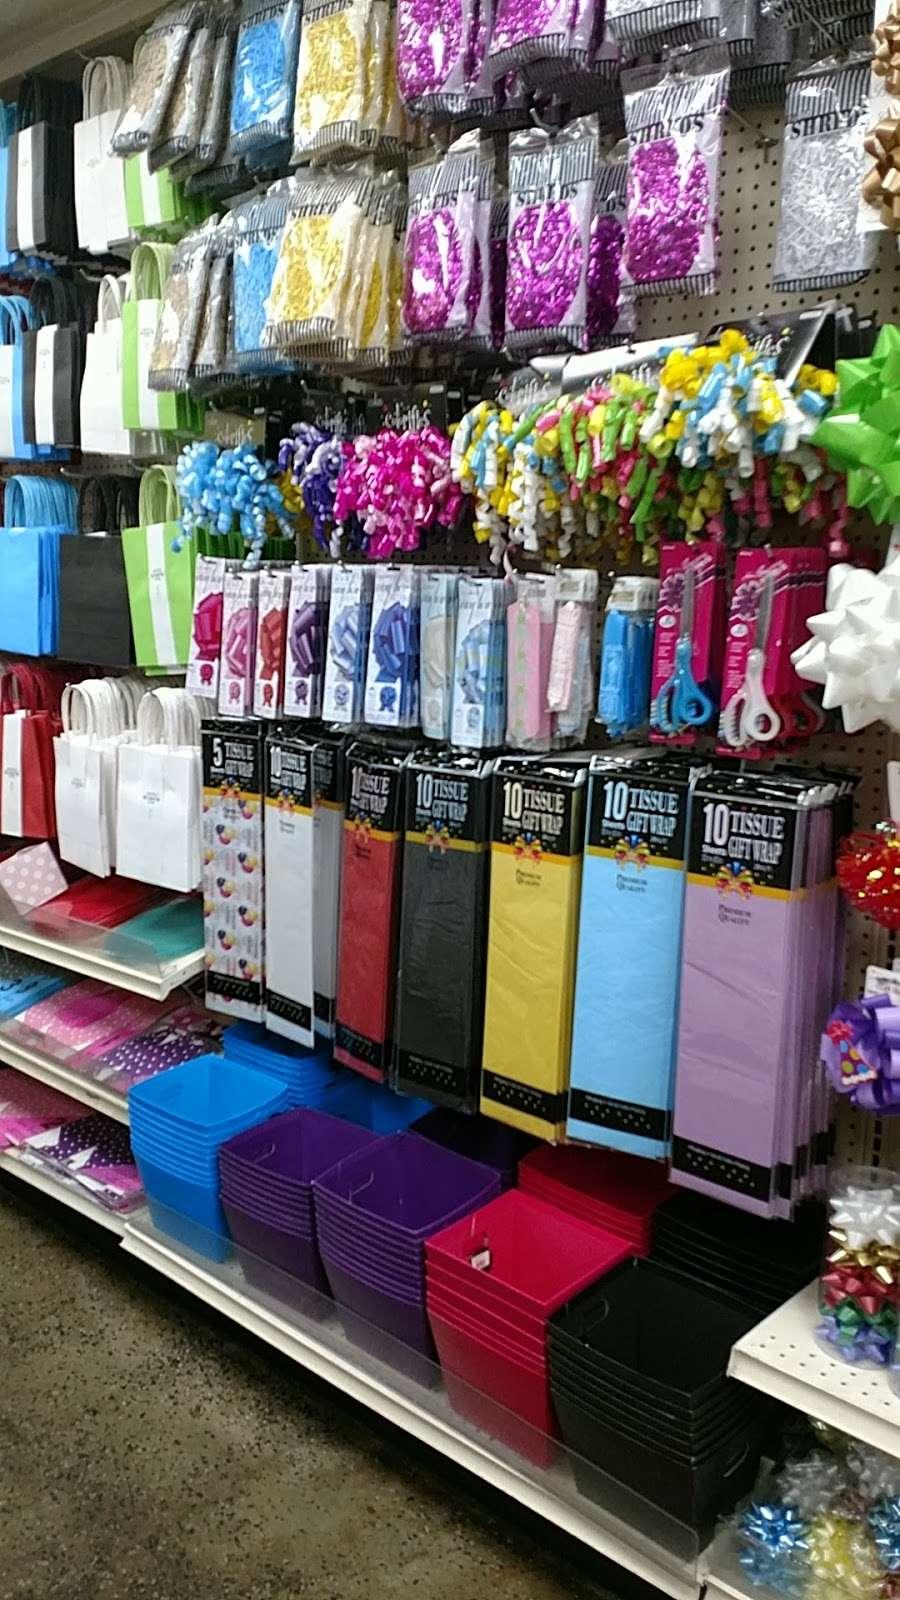 Sunland Mall Shopping Center - shopping mall  | Photo 10 of 10 | Address: Sunland-Tujunga, CA 91040, USA